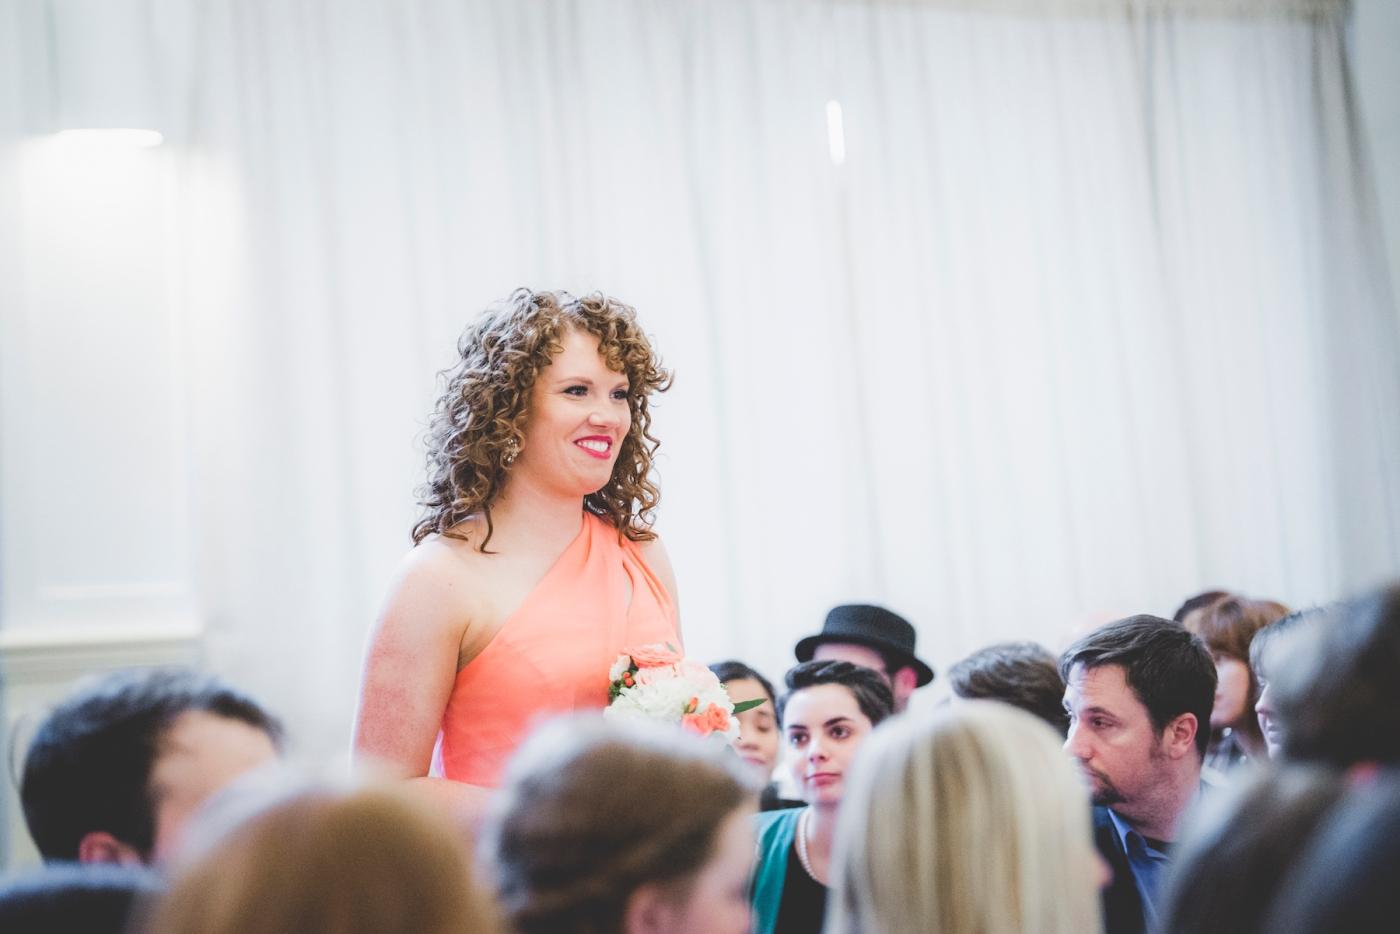 DSC_2554Everett_Wedding_Ballroom_Jane_Speleers_photography_Rachel_and_Edmund_Ceremony_2017